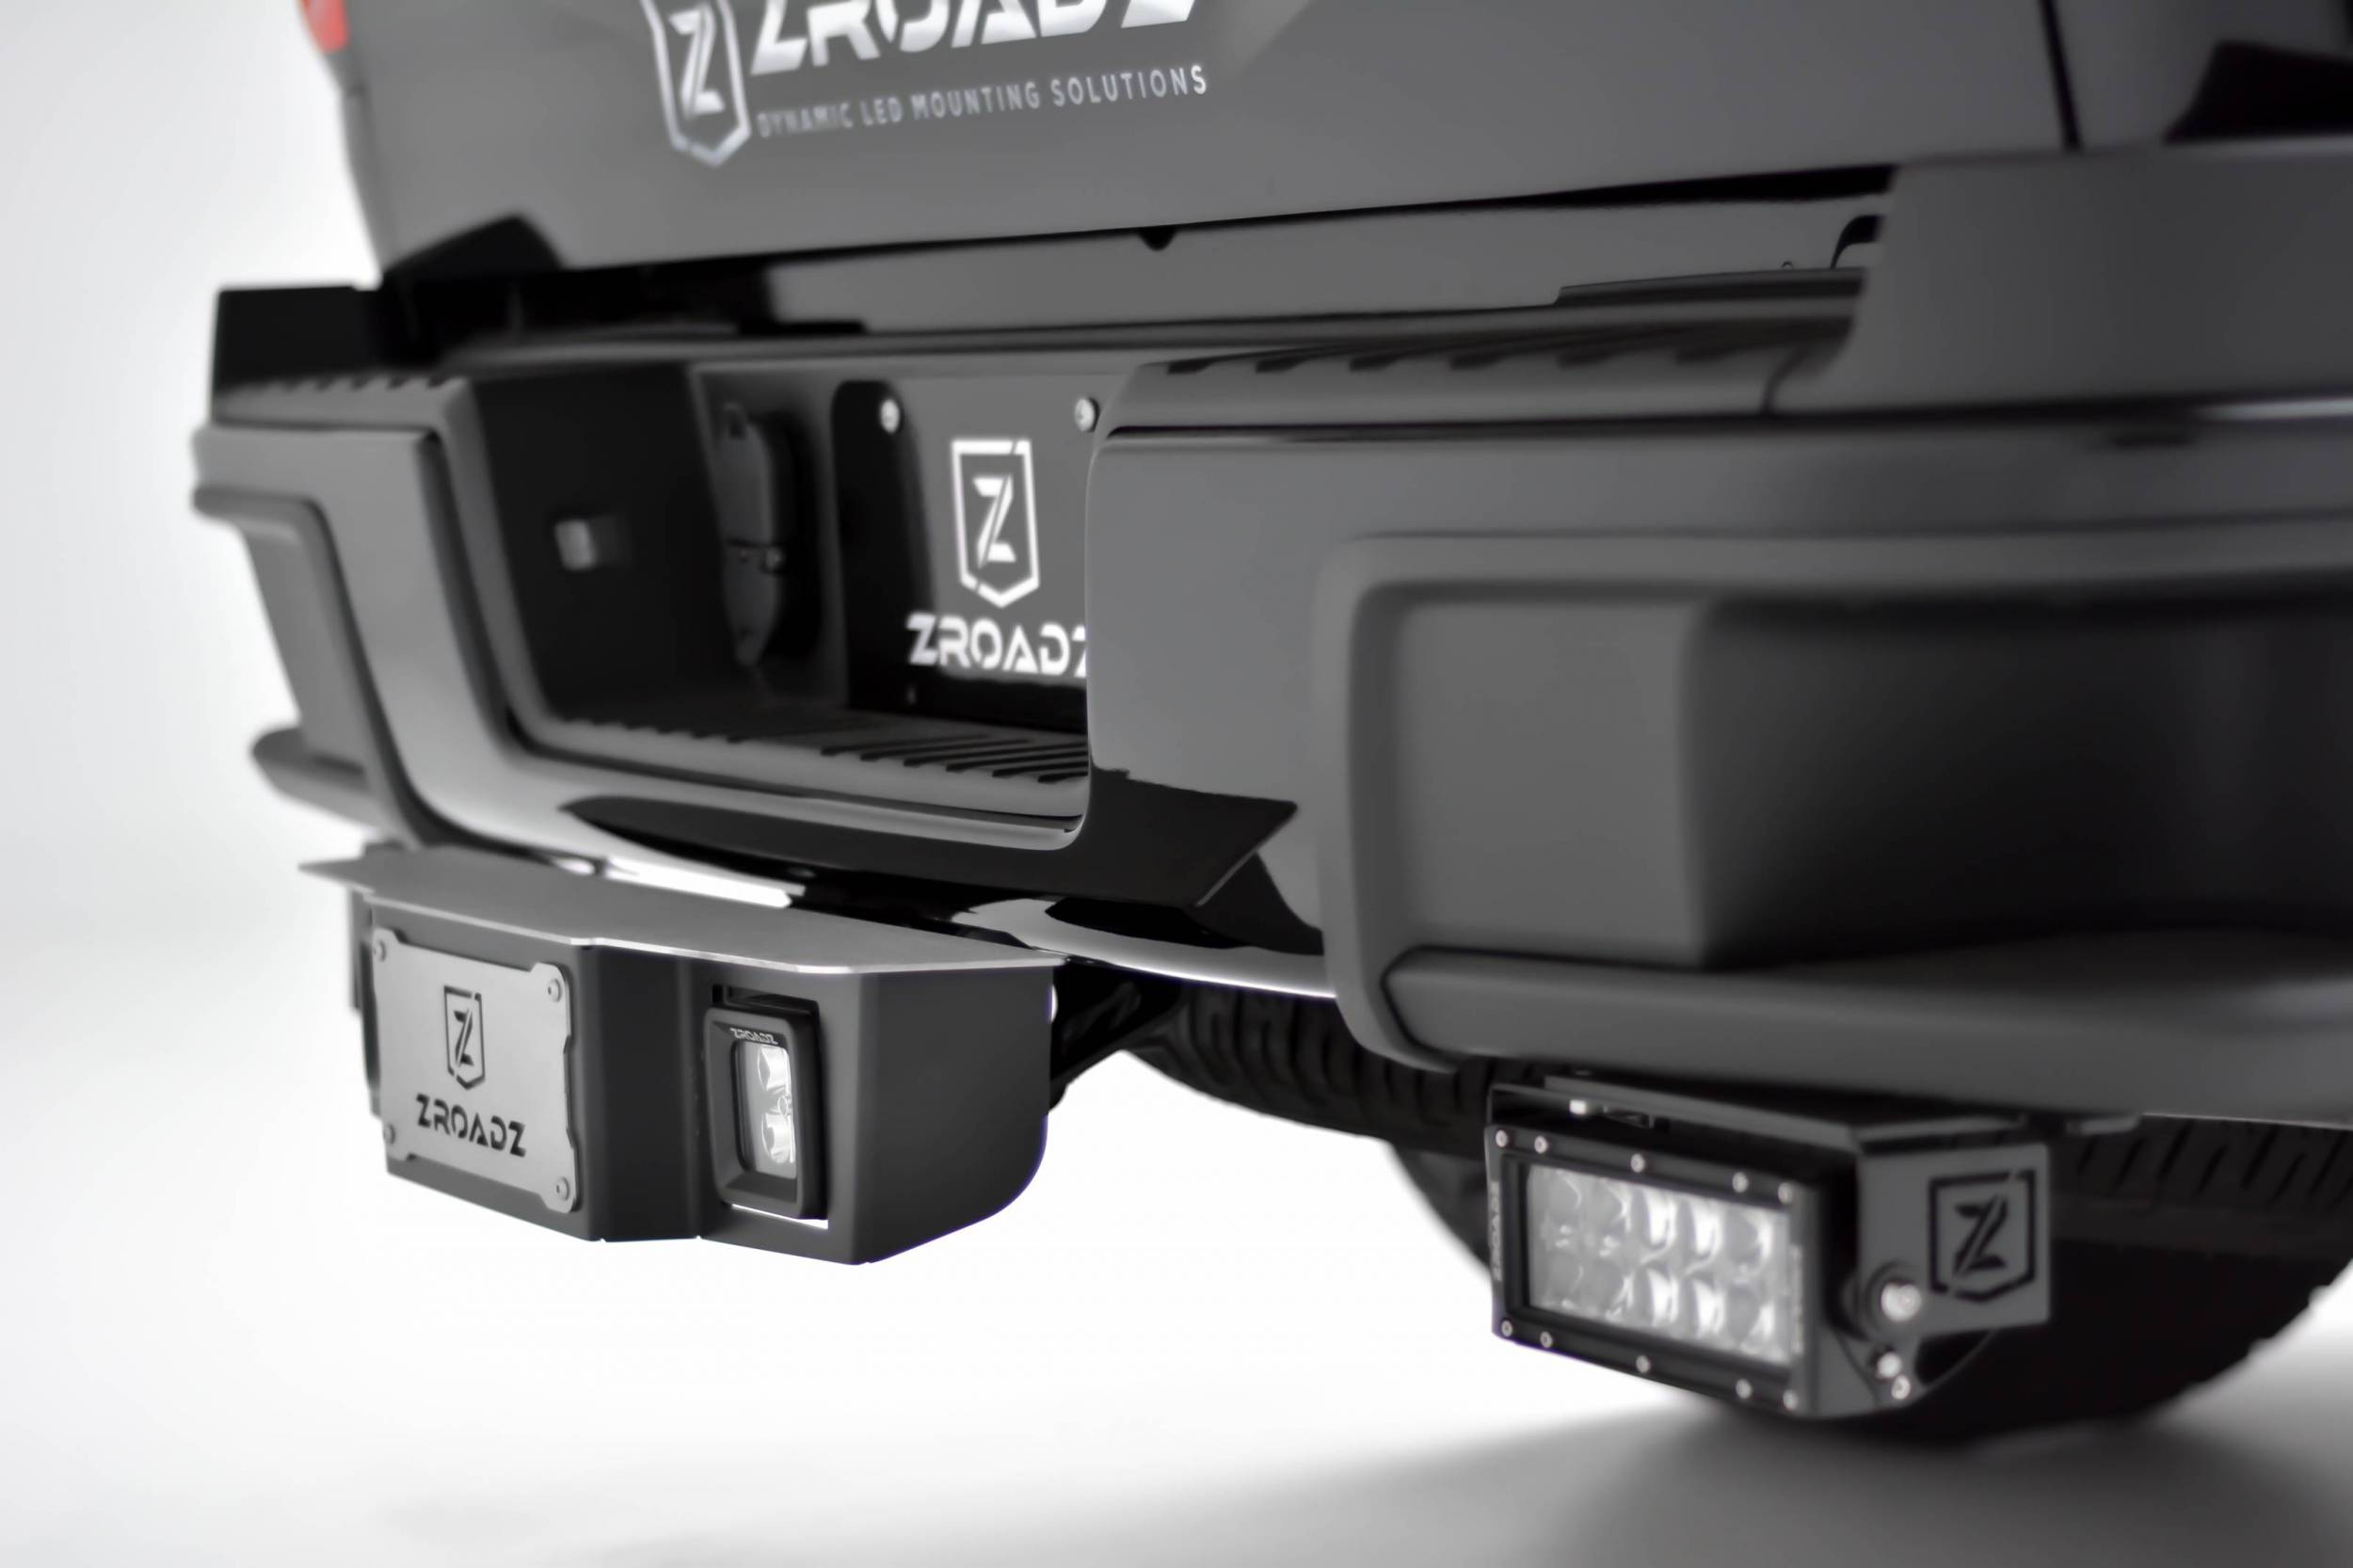 ZROADZ                                             - Universal Hitch Step LED Kit with (2) 3 Inch LED Pod Lights, Fits 2.5 Inch Receiver - PN #Z390011-KIT